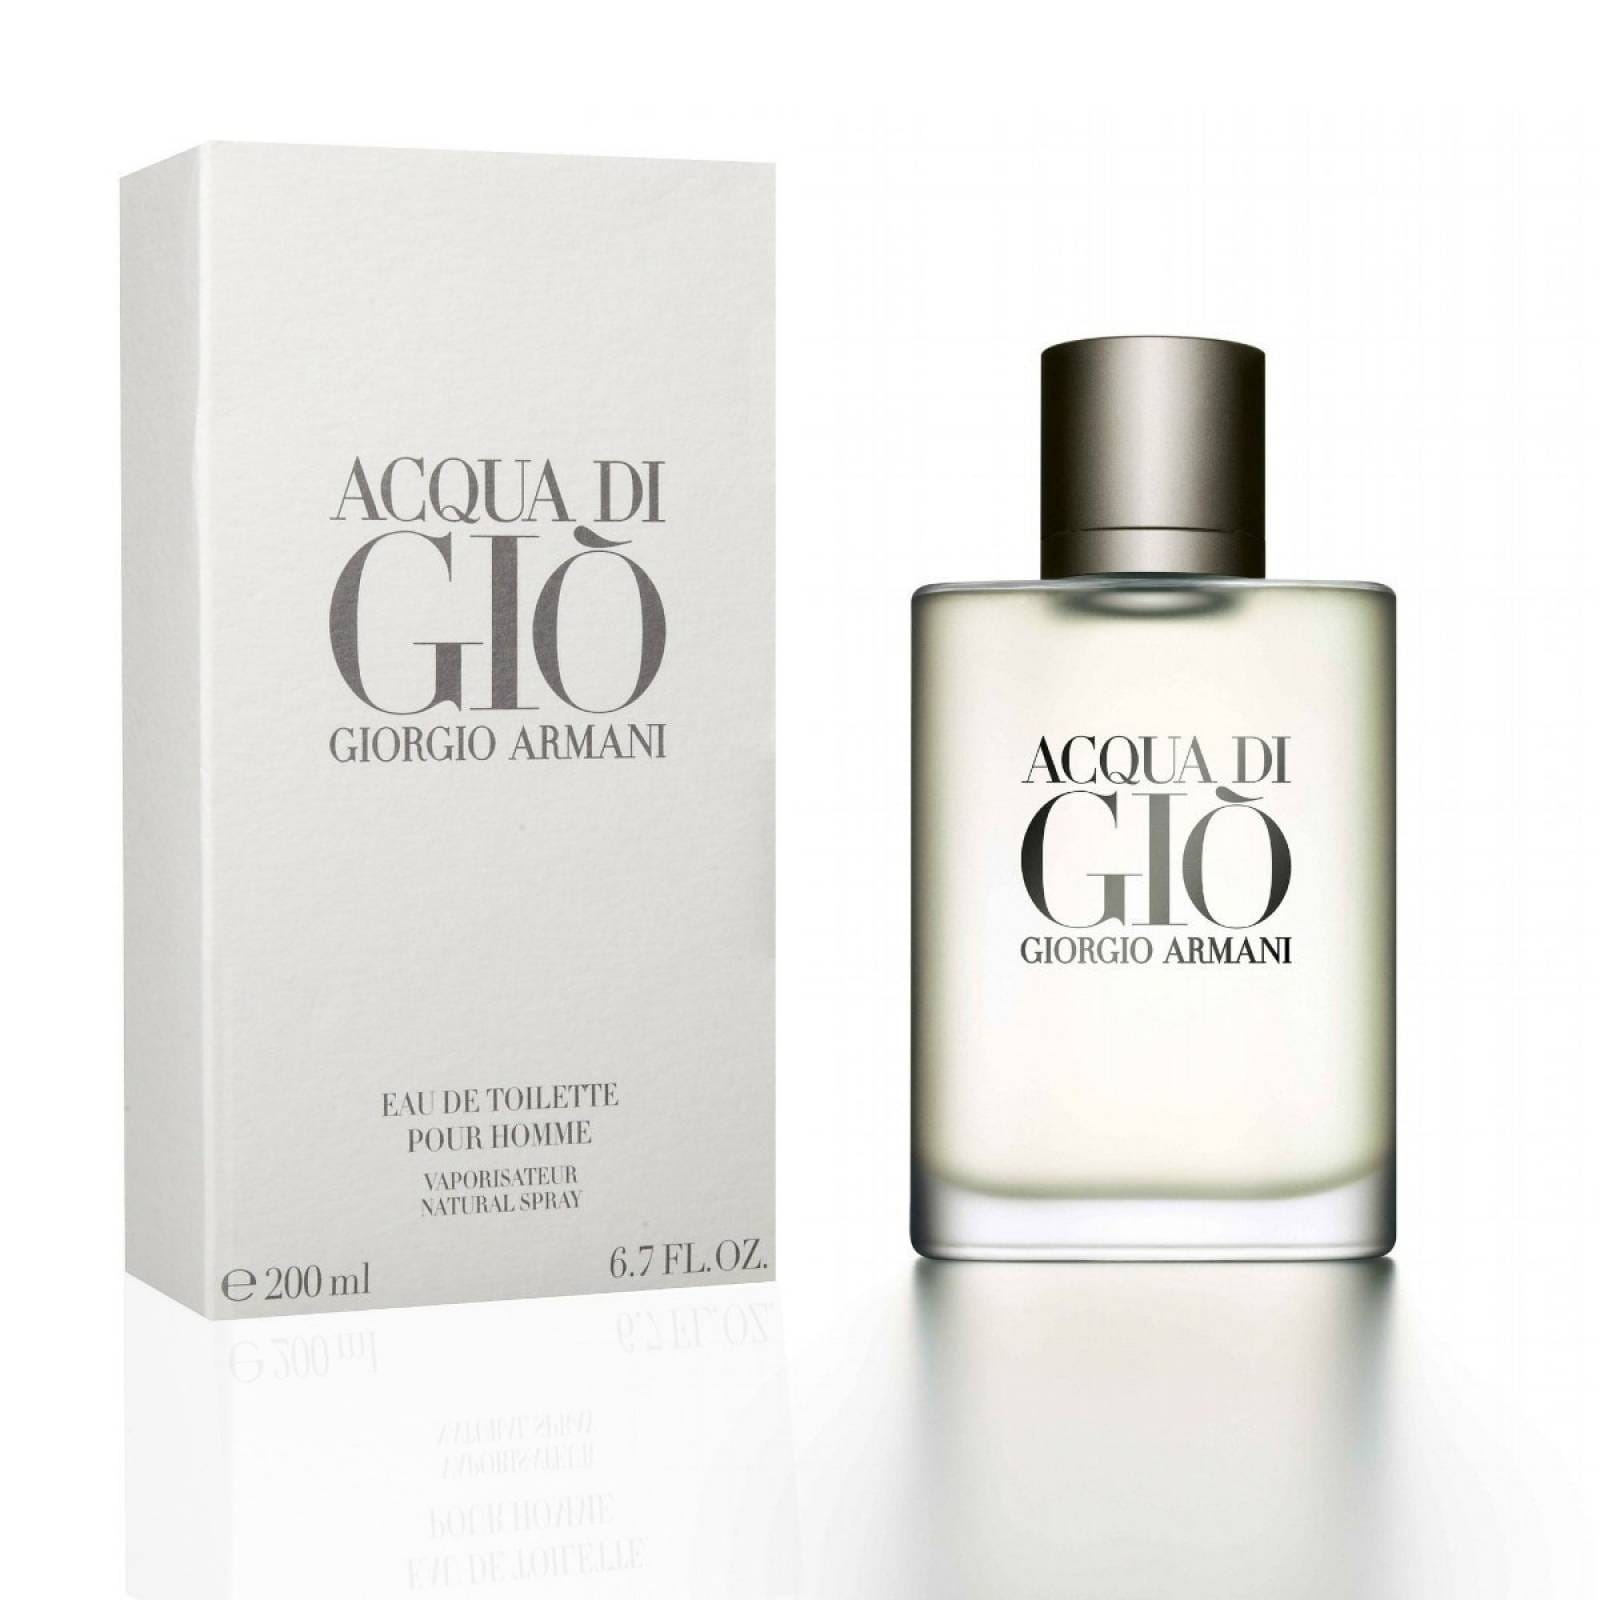 Acqua Di Gio Homme de Giorgio Armani Eau de Toilette 200 ml. Fragancia para Caballero